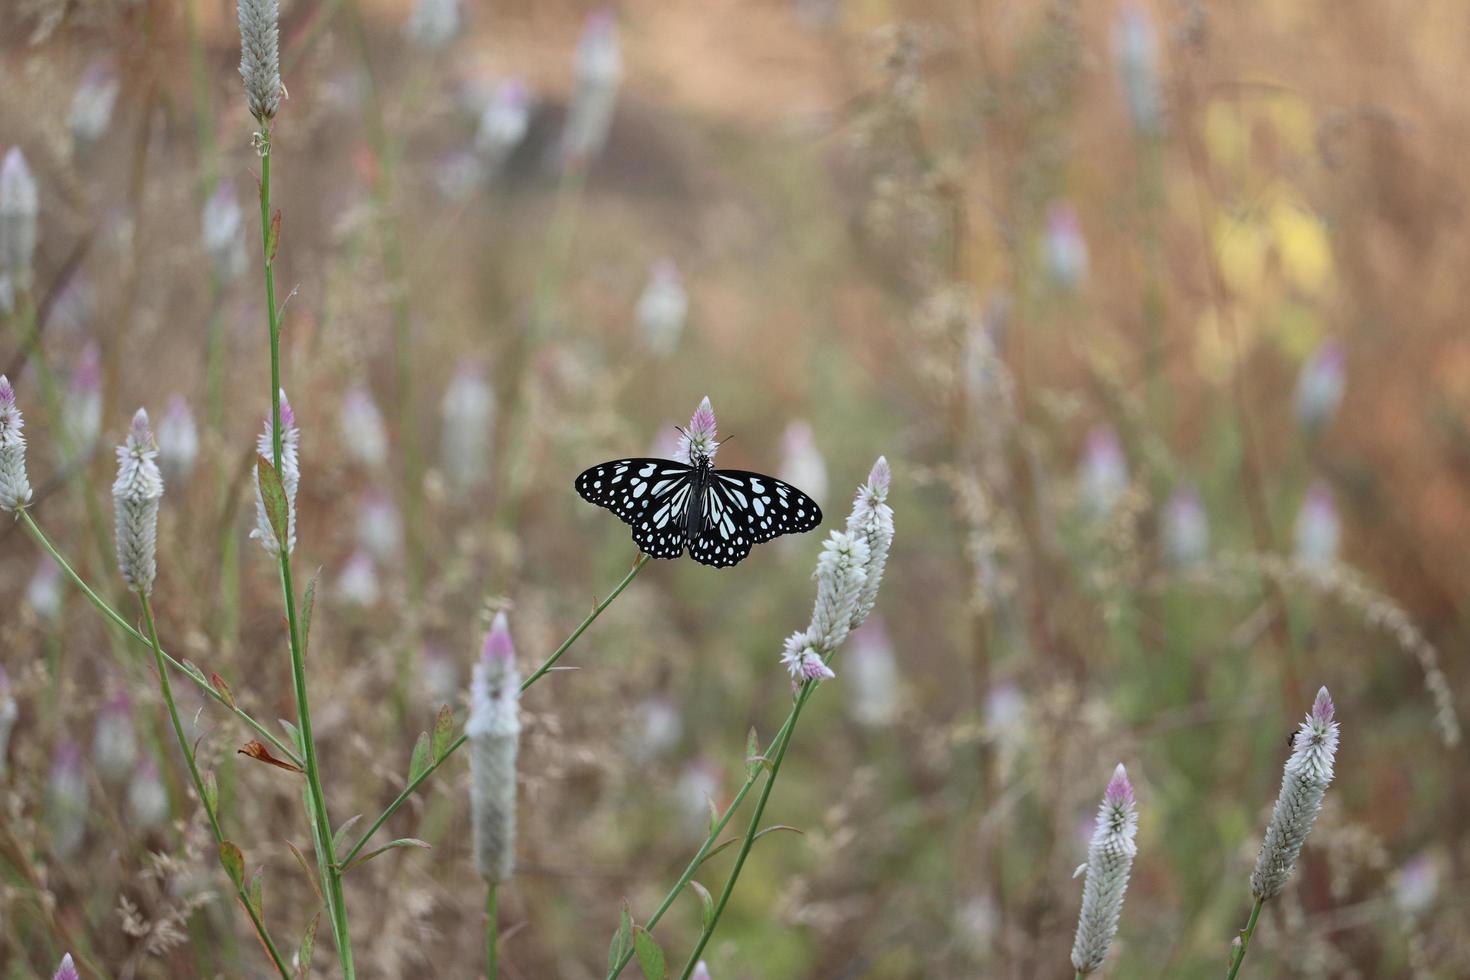 Butterfly on plant in field photo